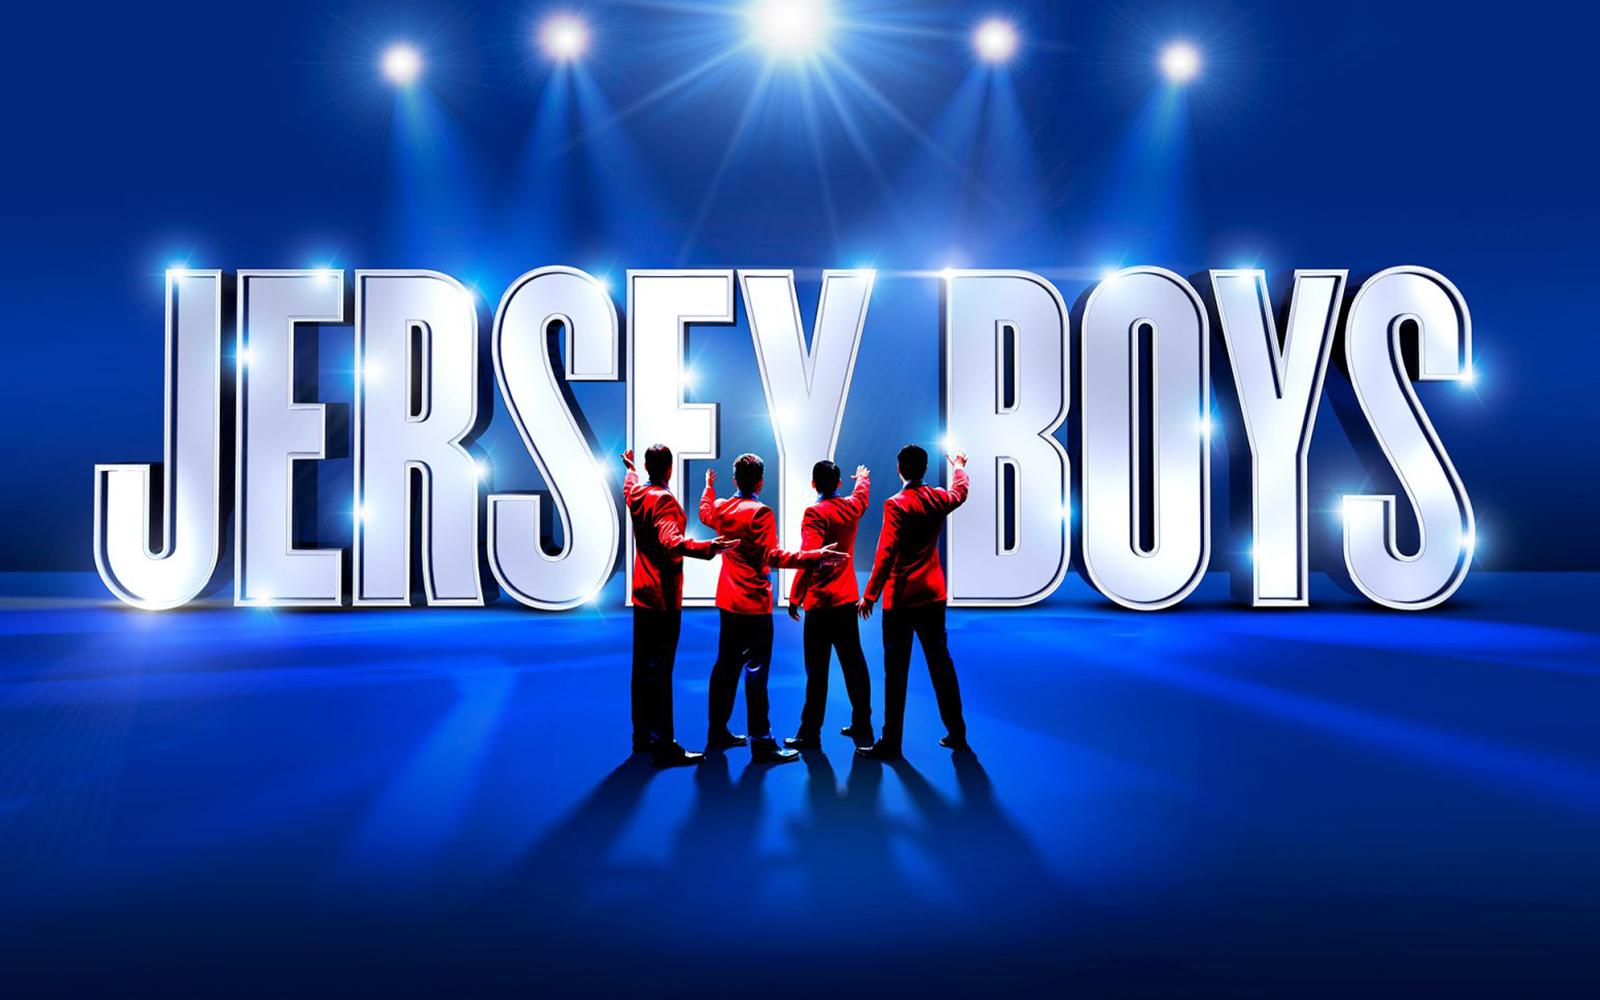 Jersey Boys - London Musicals